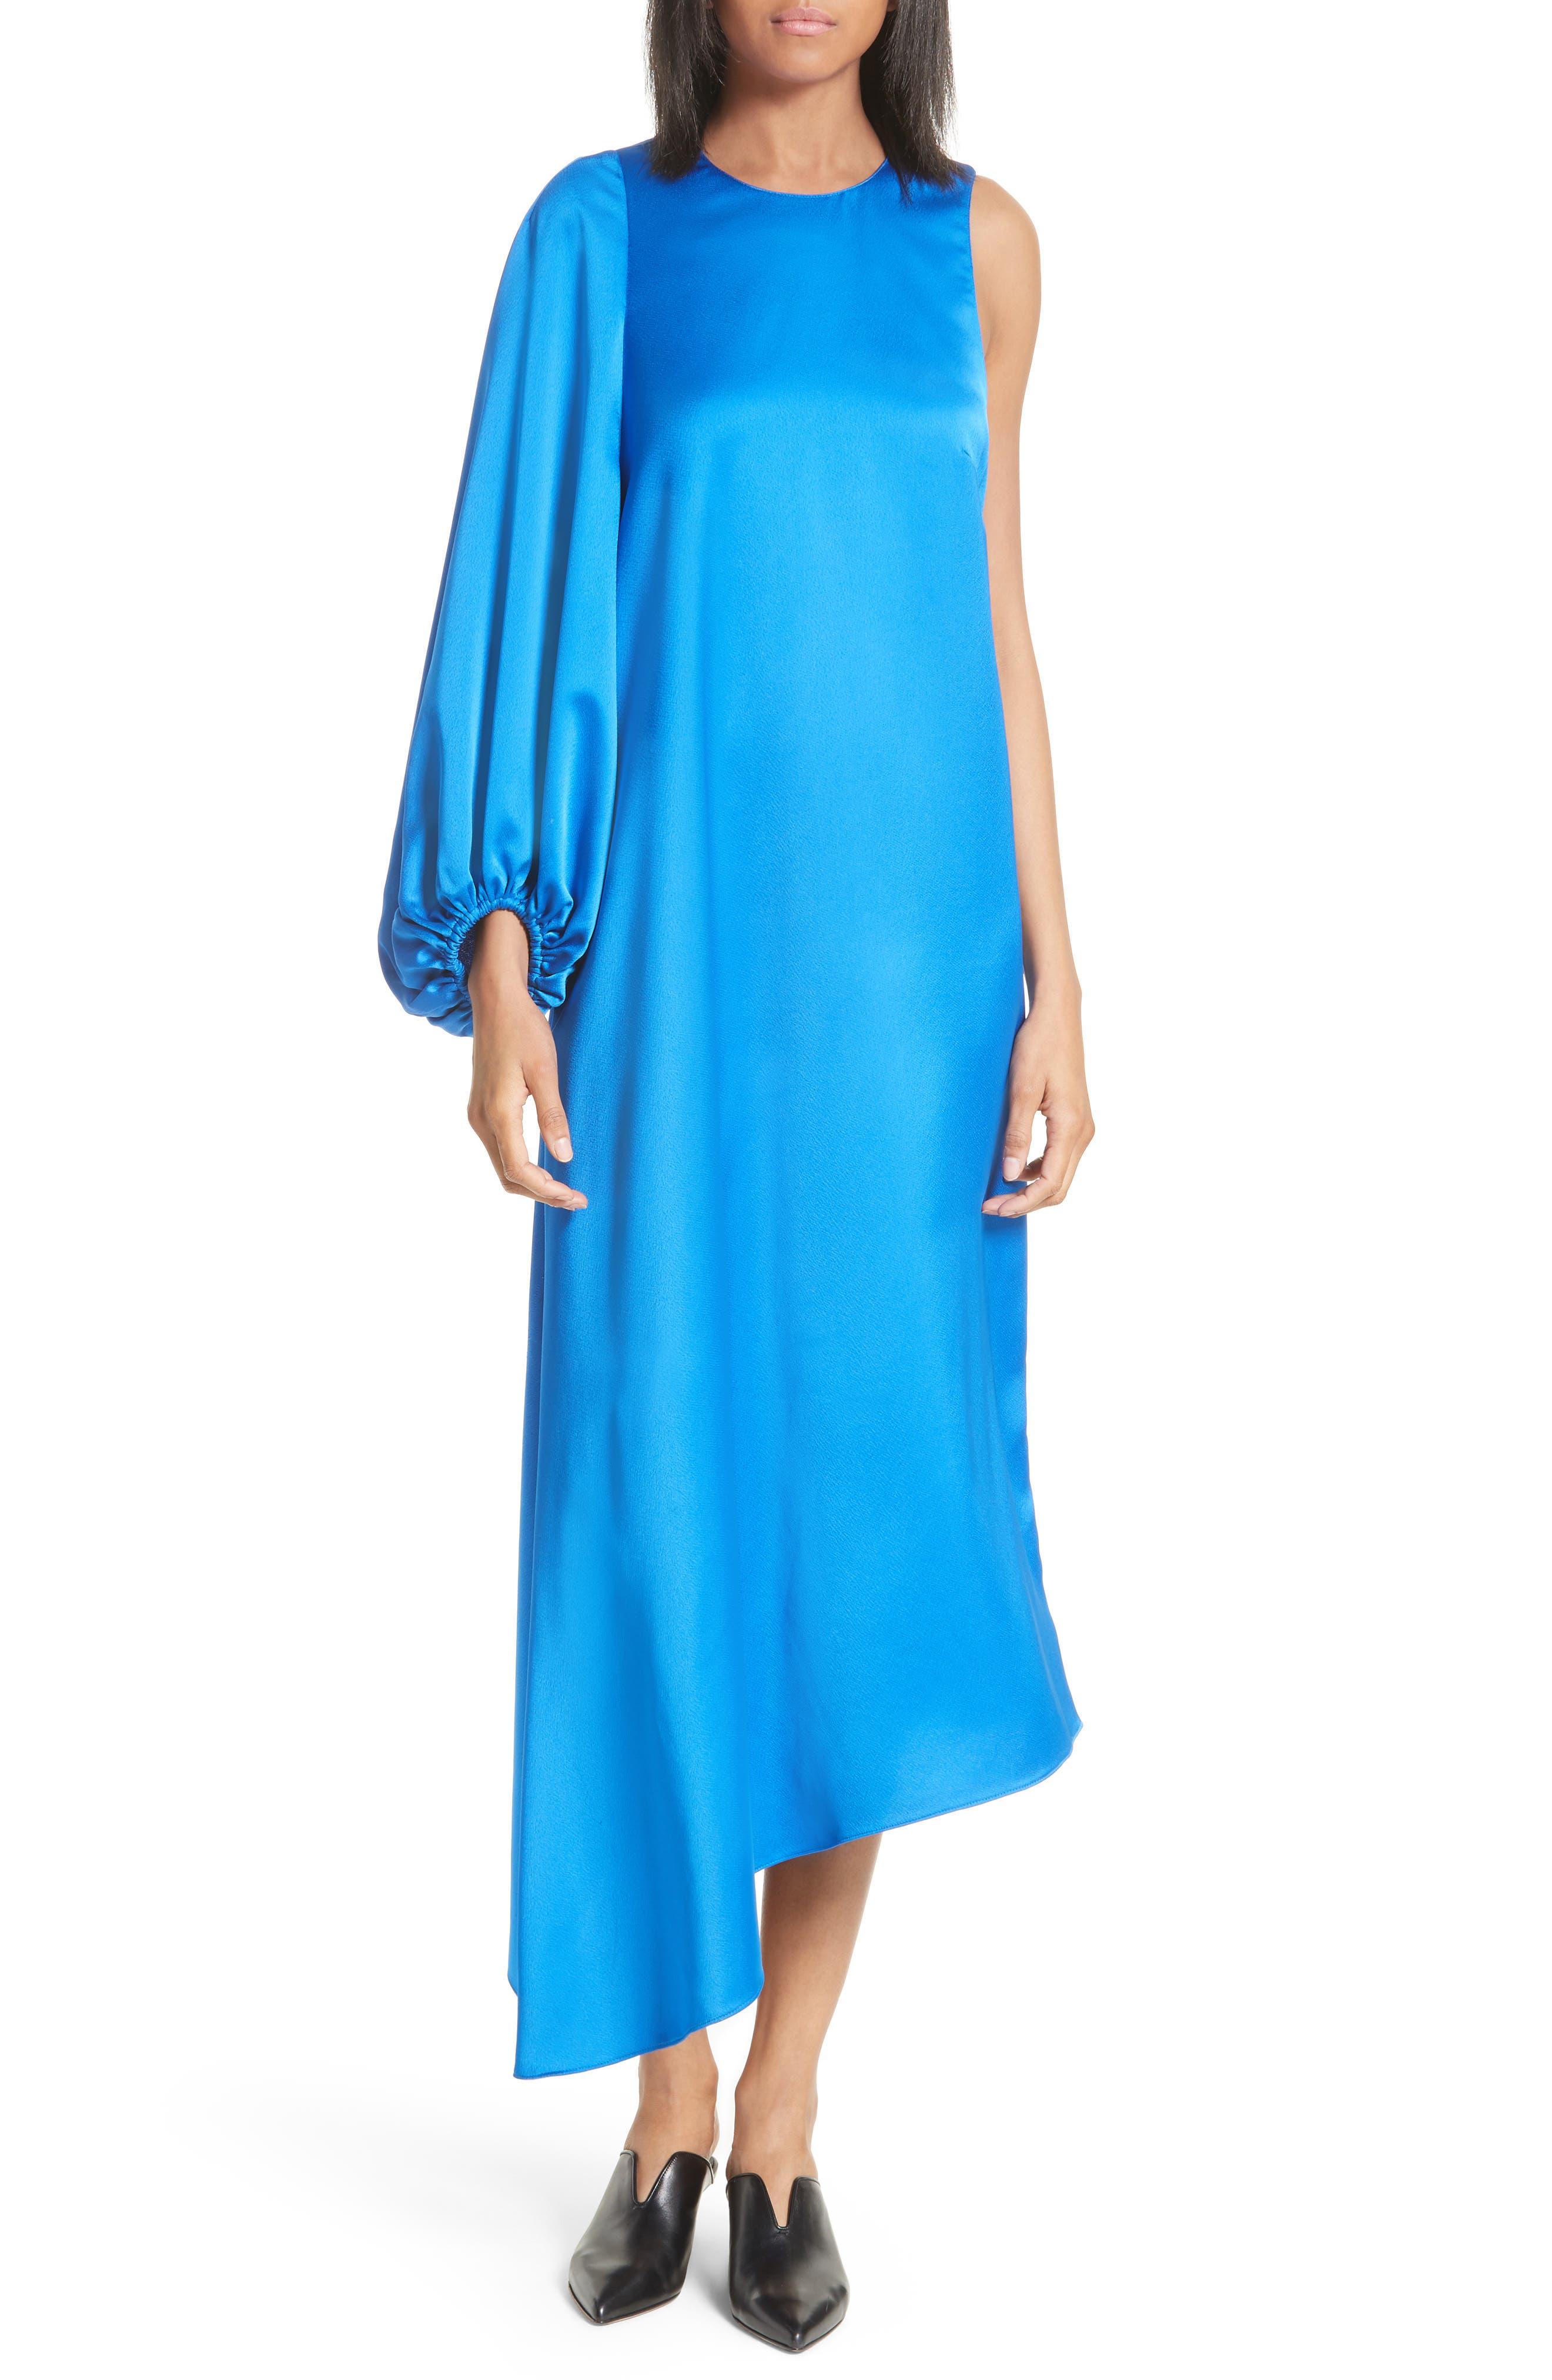 Main Image - Tibi Celestia One Sleeve Bias Cut Satin Dress